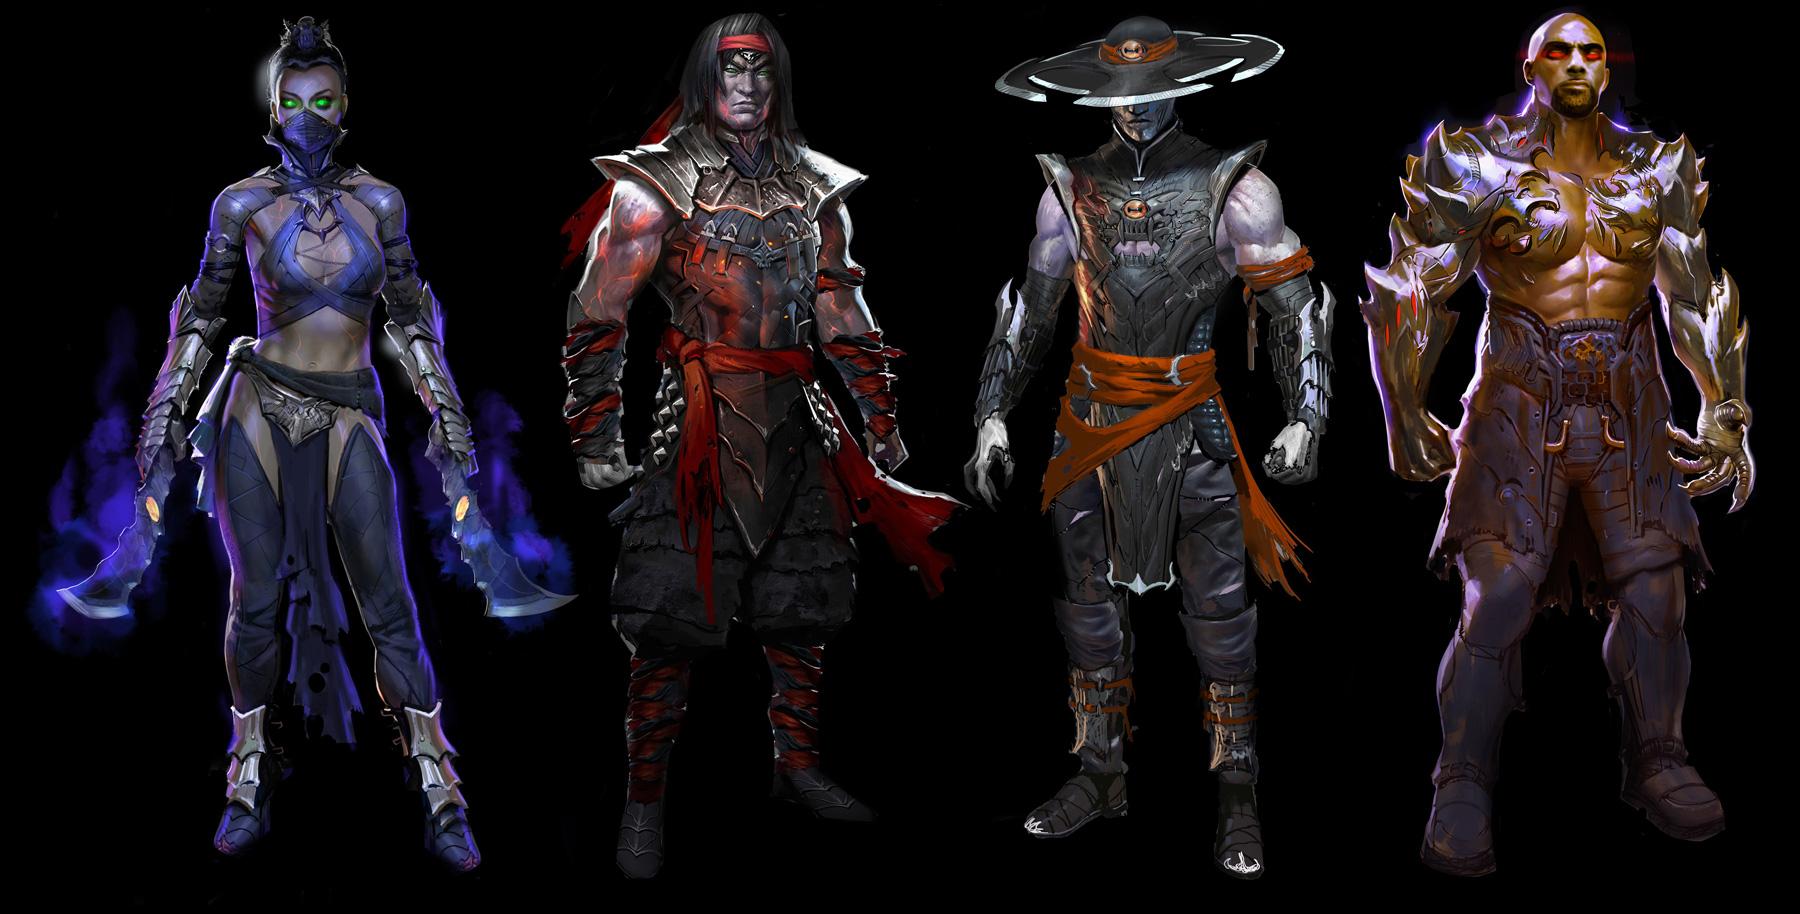 Exclusive Mortal Kombat X Concept Art By Marco Nelor Concept